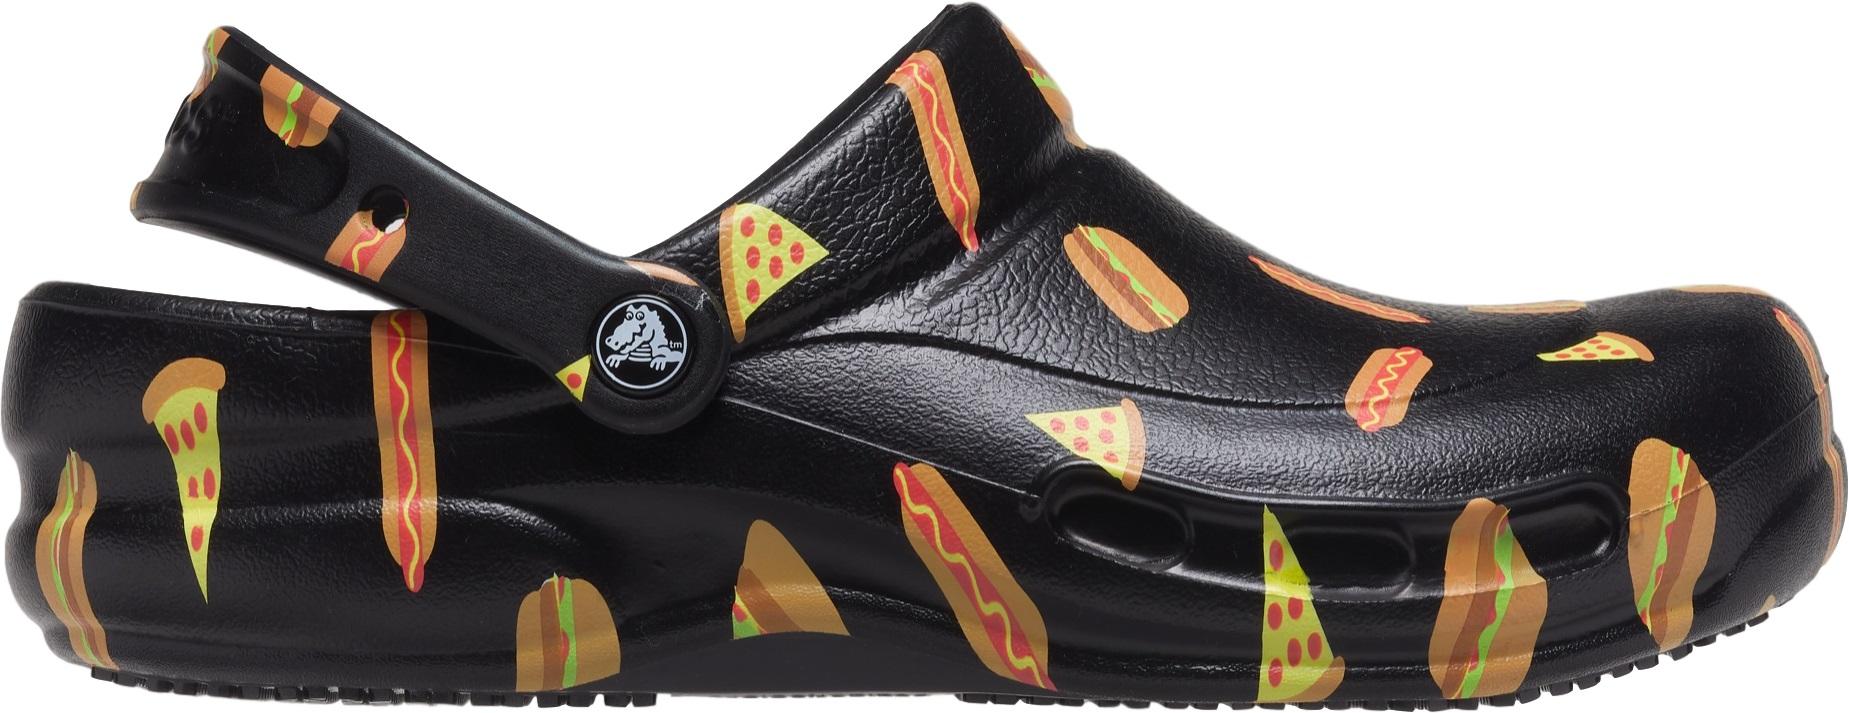 Crocs™ Bistro Graphic Clog Multi Black/Black 36,5